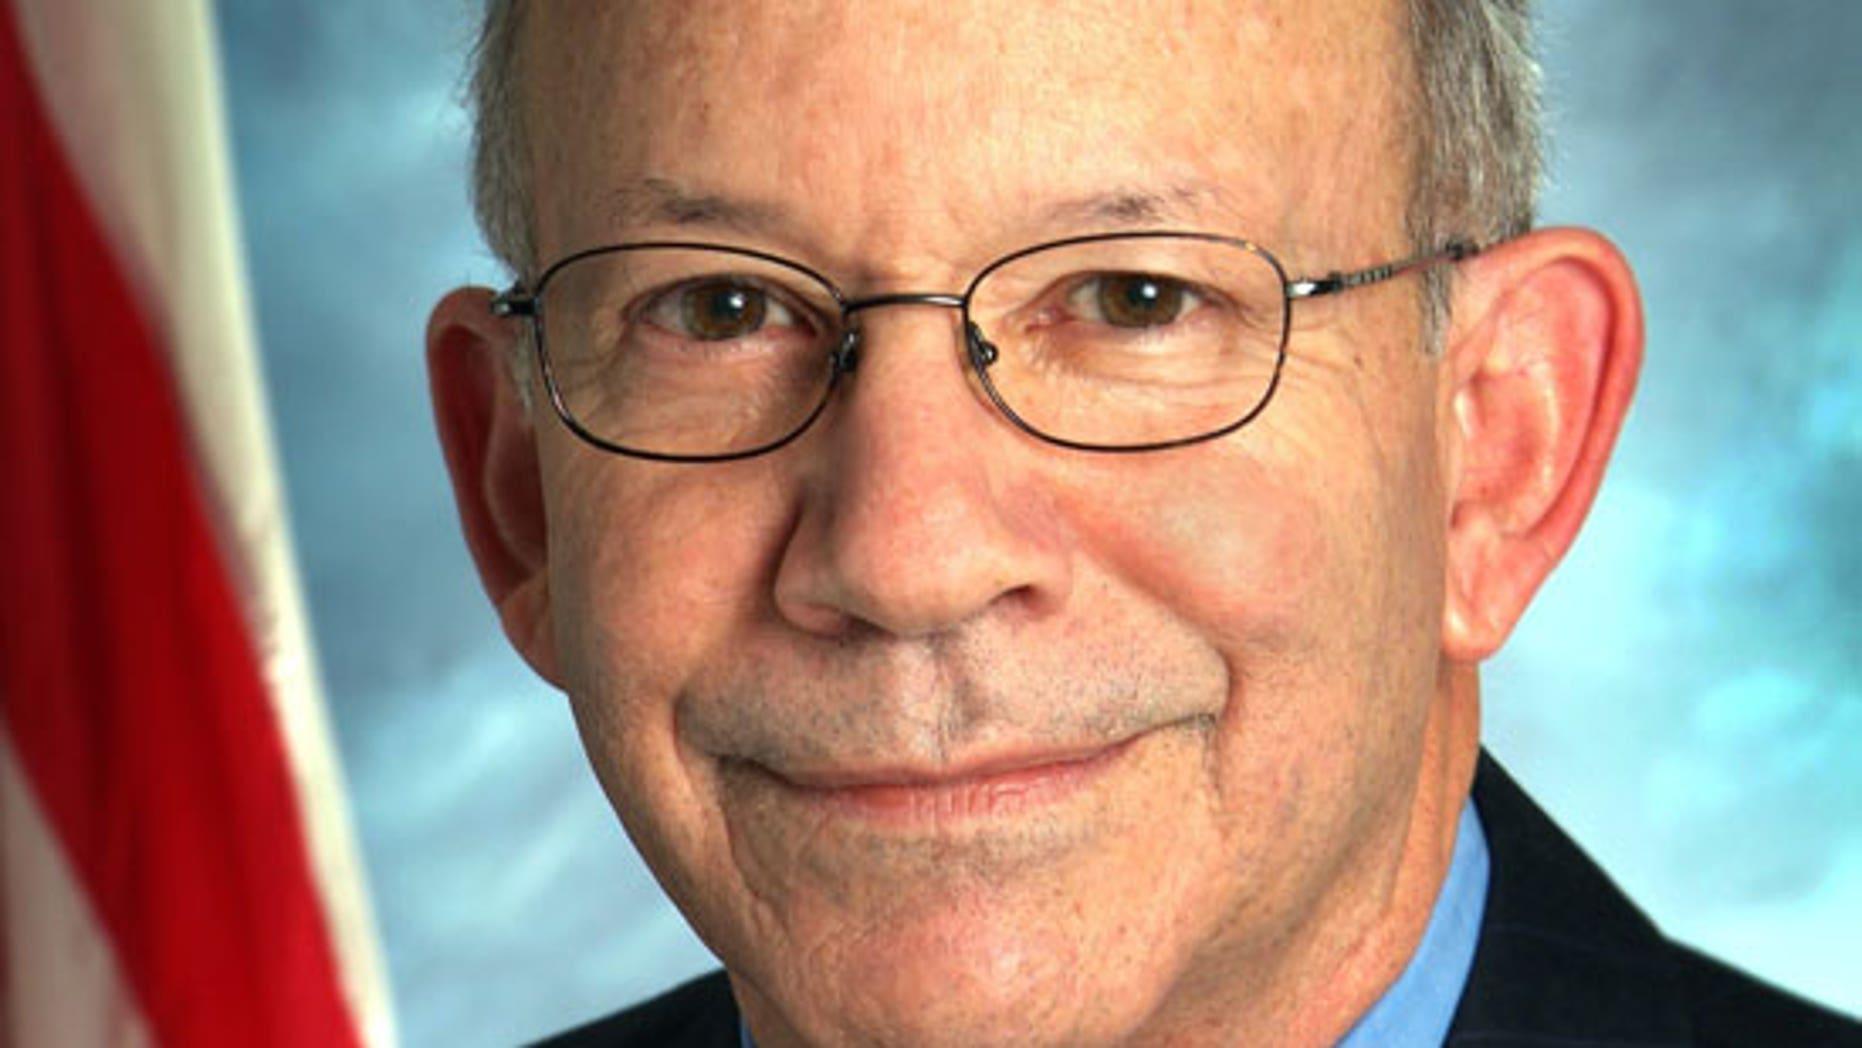 Oregon Rep. Peter DeFazio in a congressional headshot. (DeFazio office)